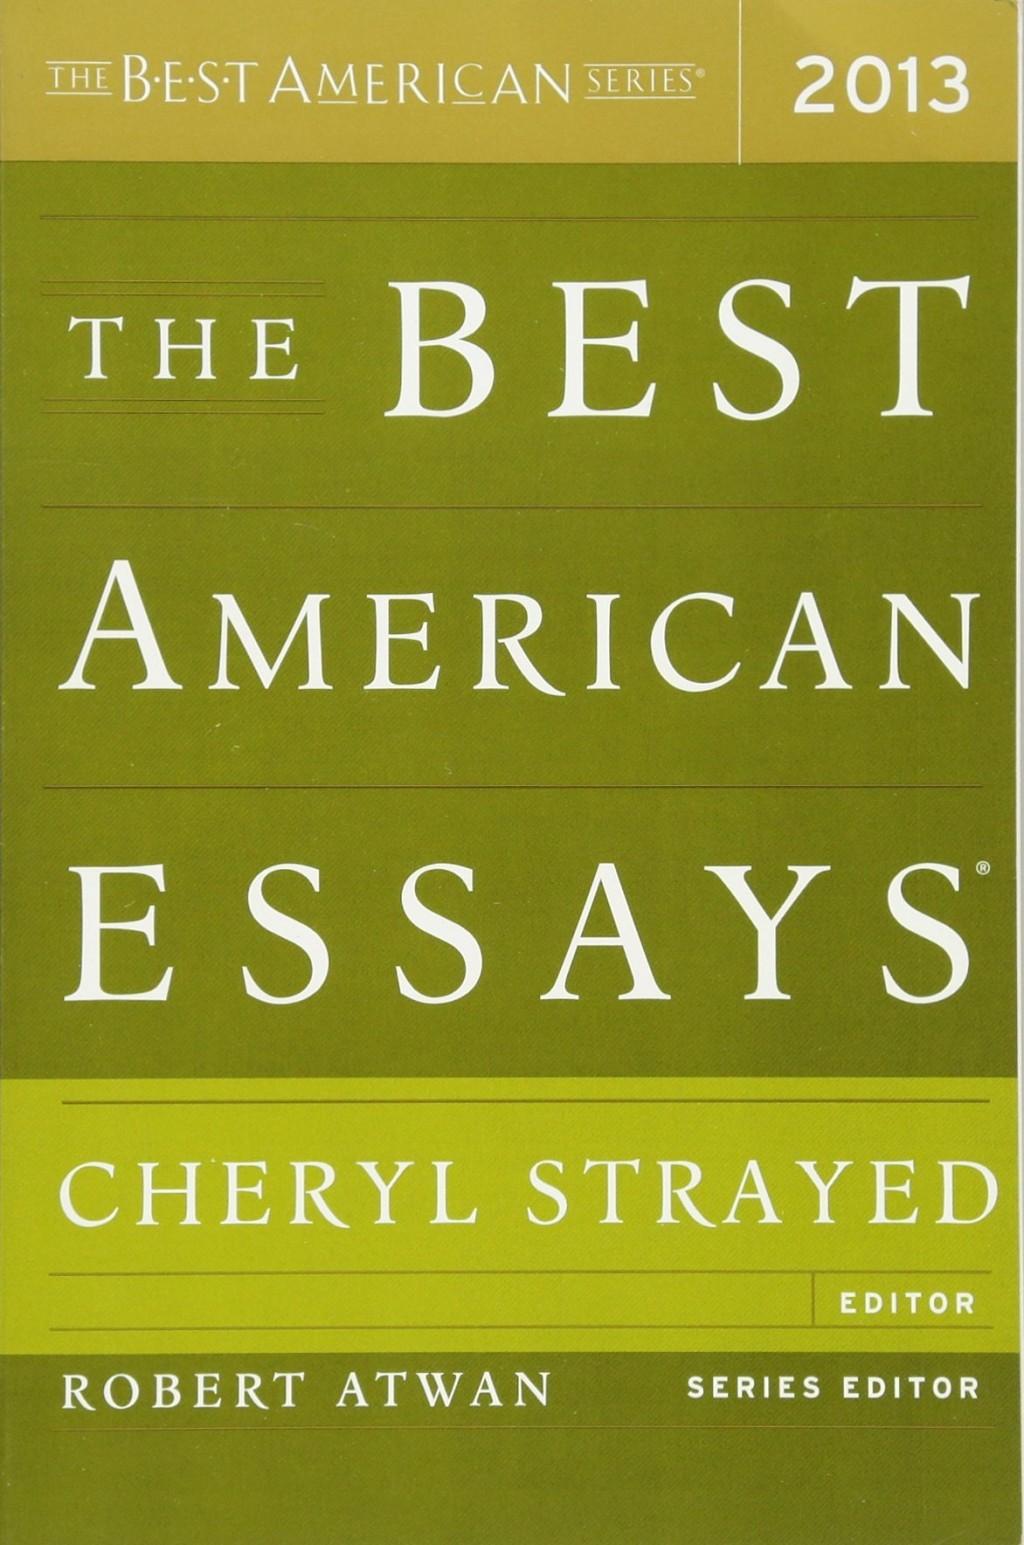 003 The Best American Essays 81nkls2j9vl Essay Wonderful 2018 Pdf 2017 Table Of Contents 2015 Free Large